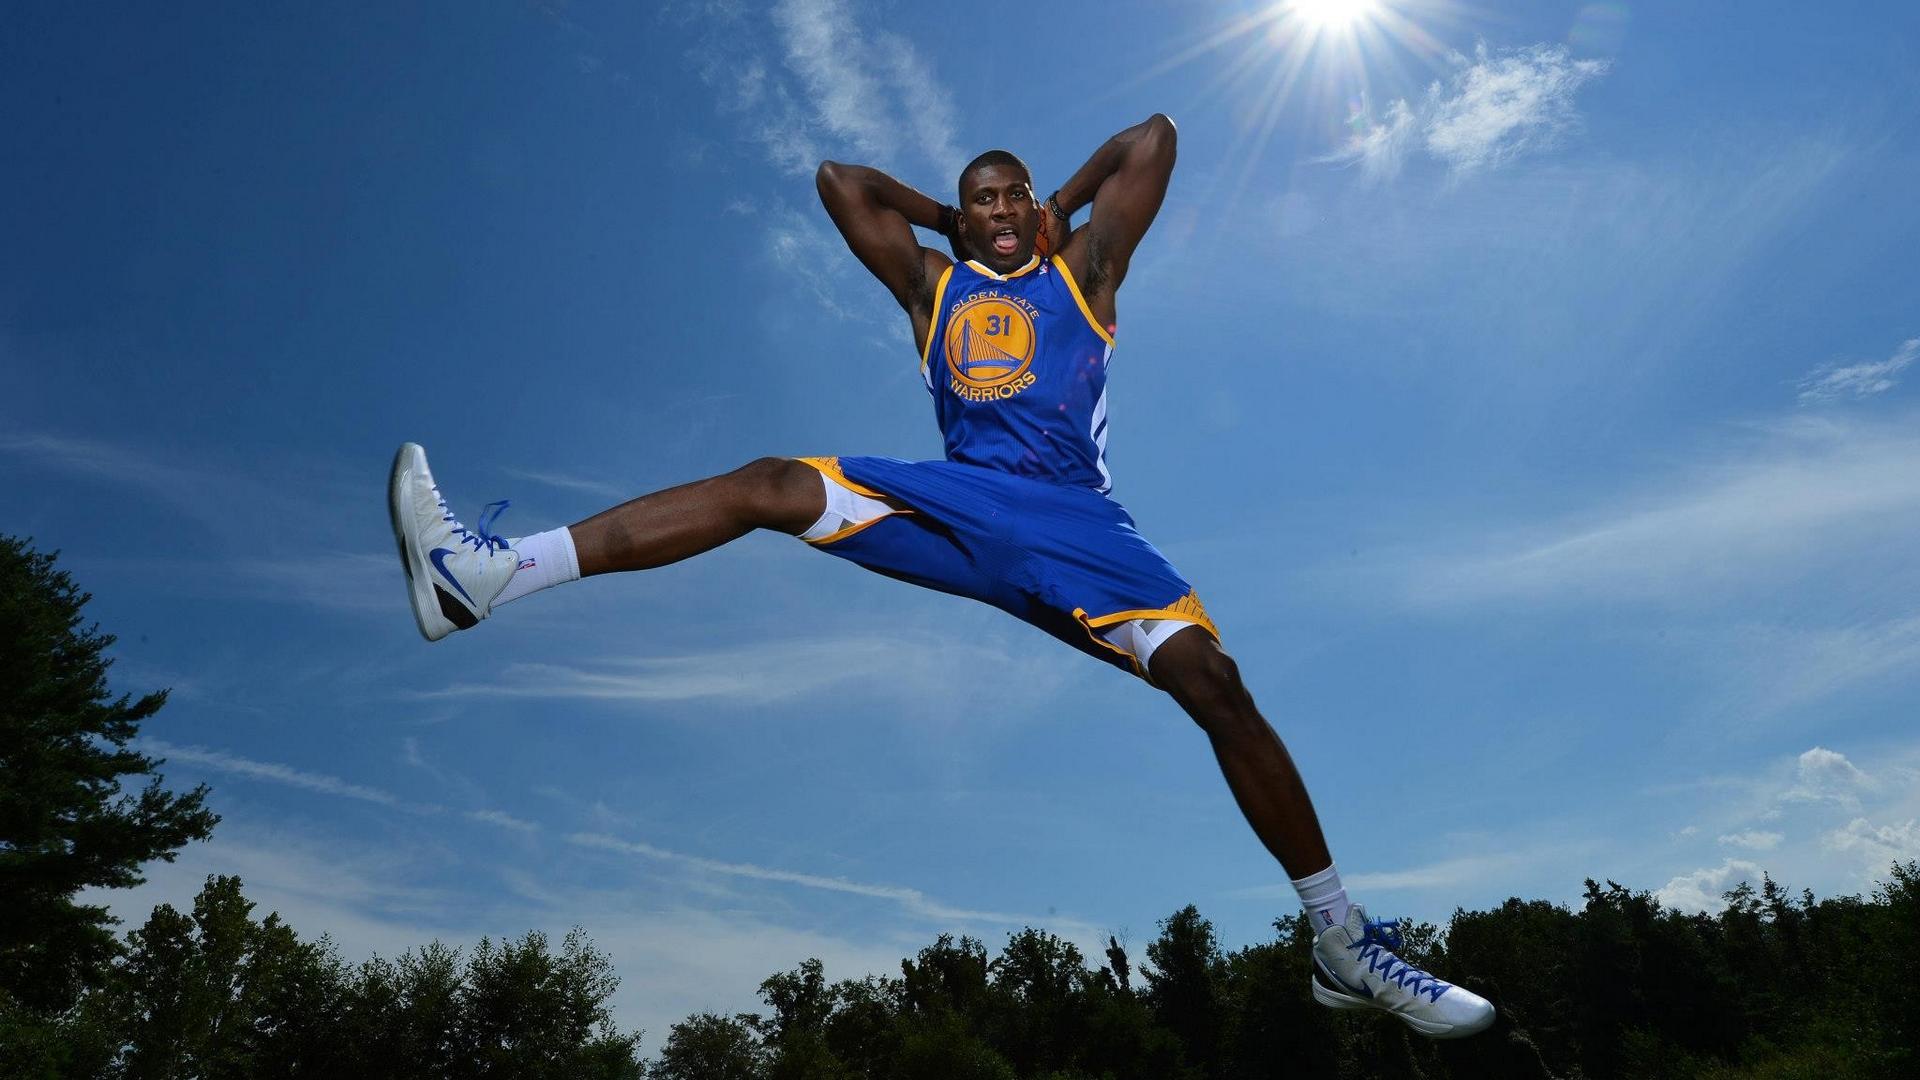 баскетболист, спортсмен, мяч